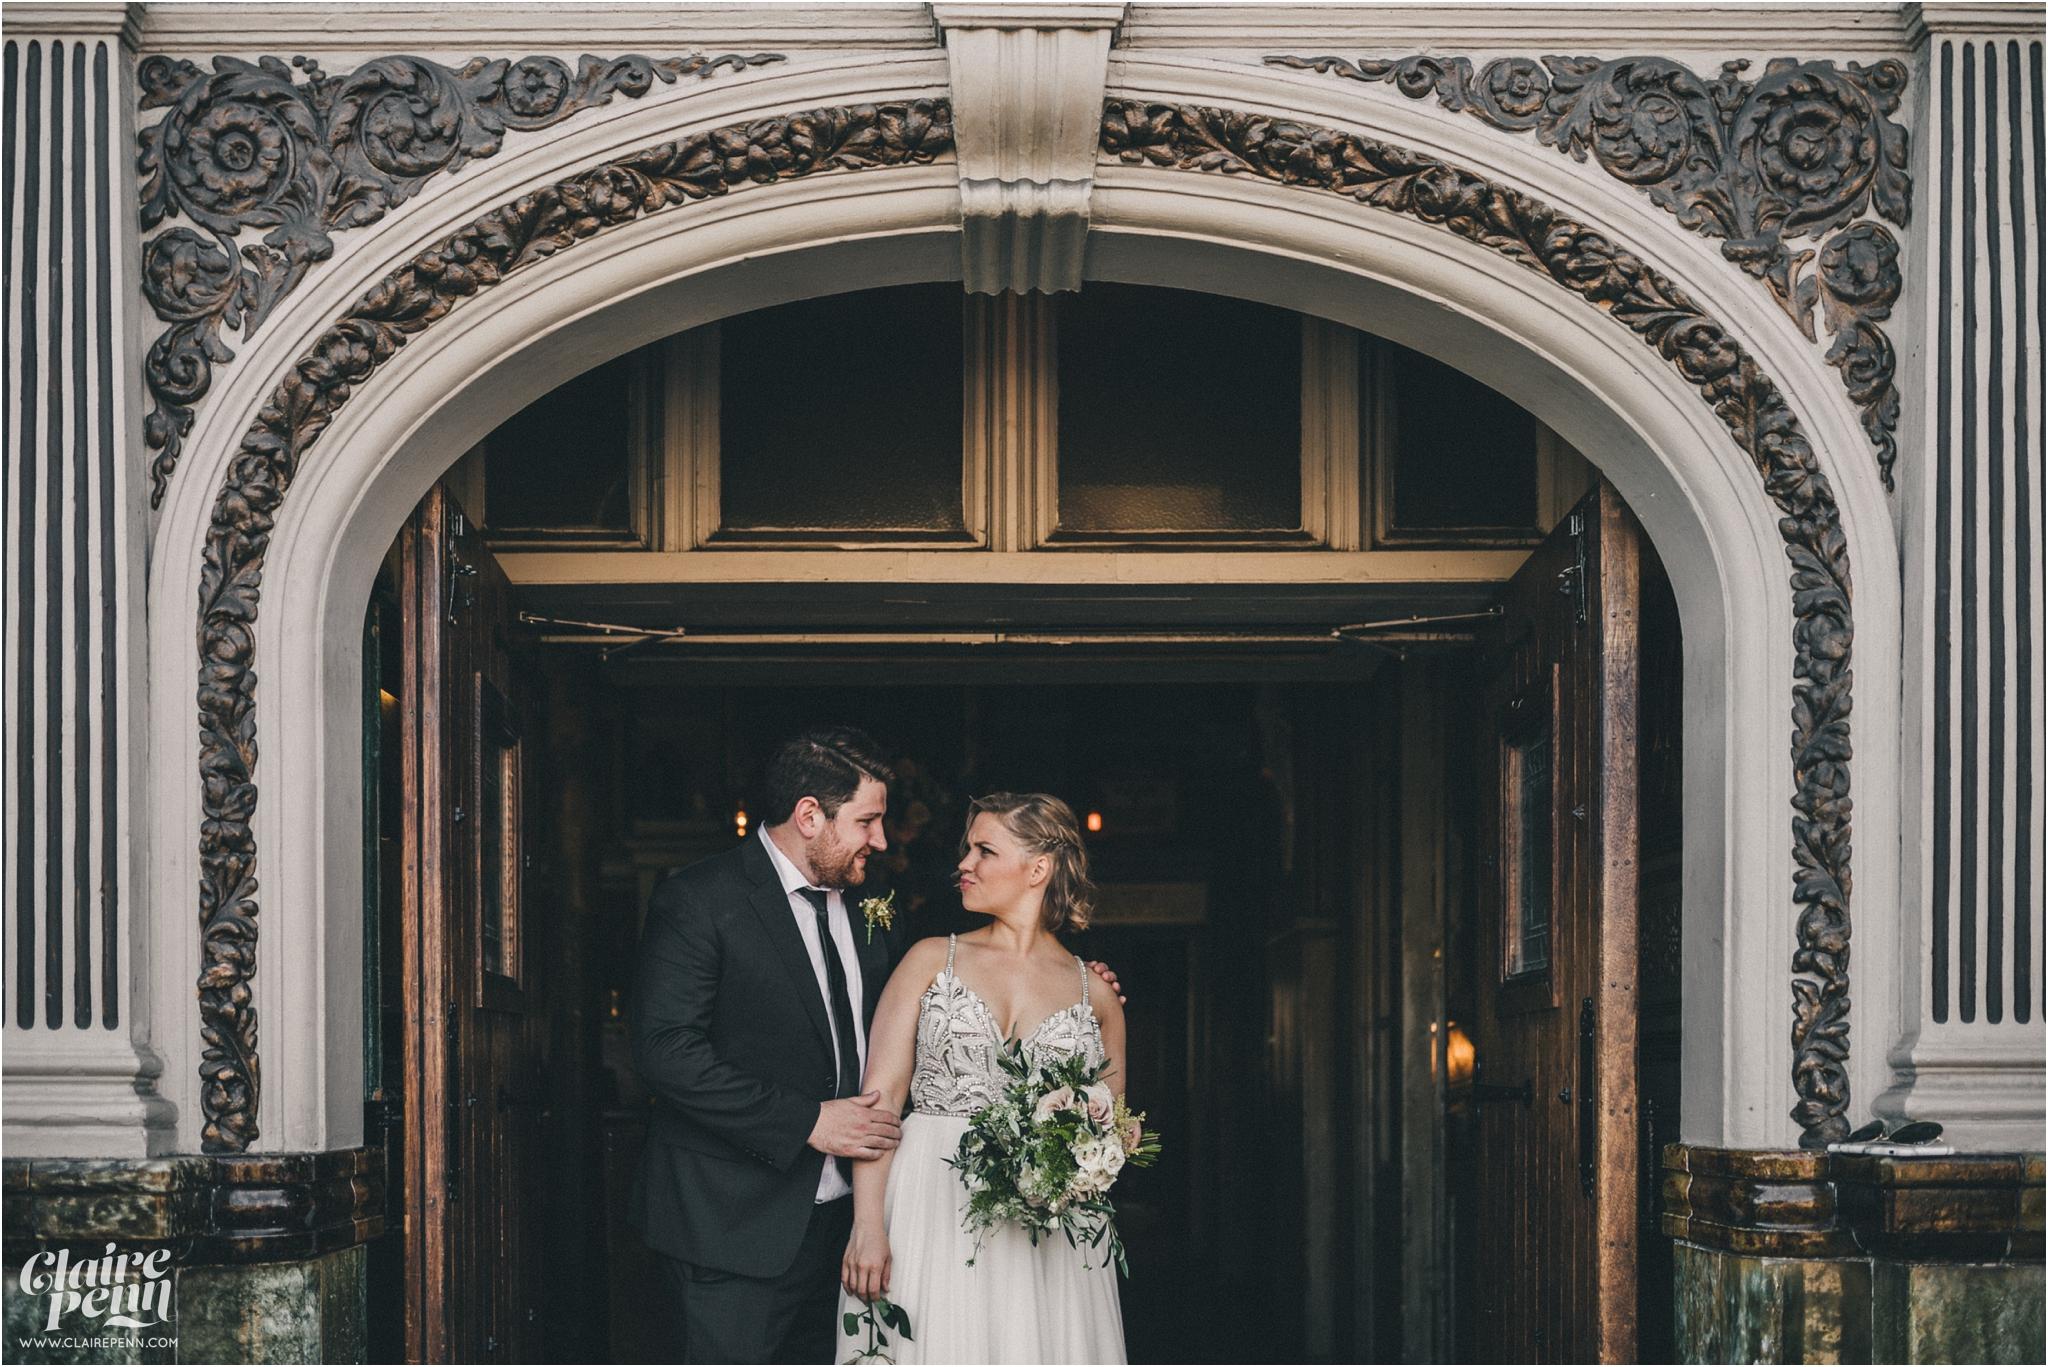 Paradise by way of Kensall Green London pub intimate wedding_0059.jpg